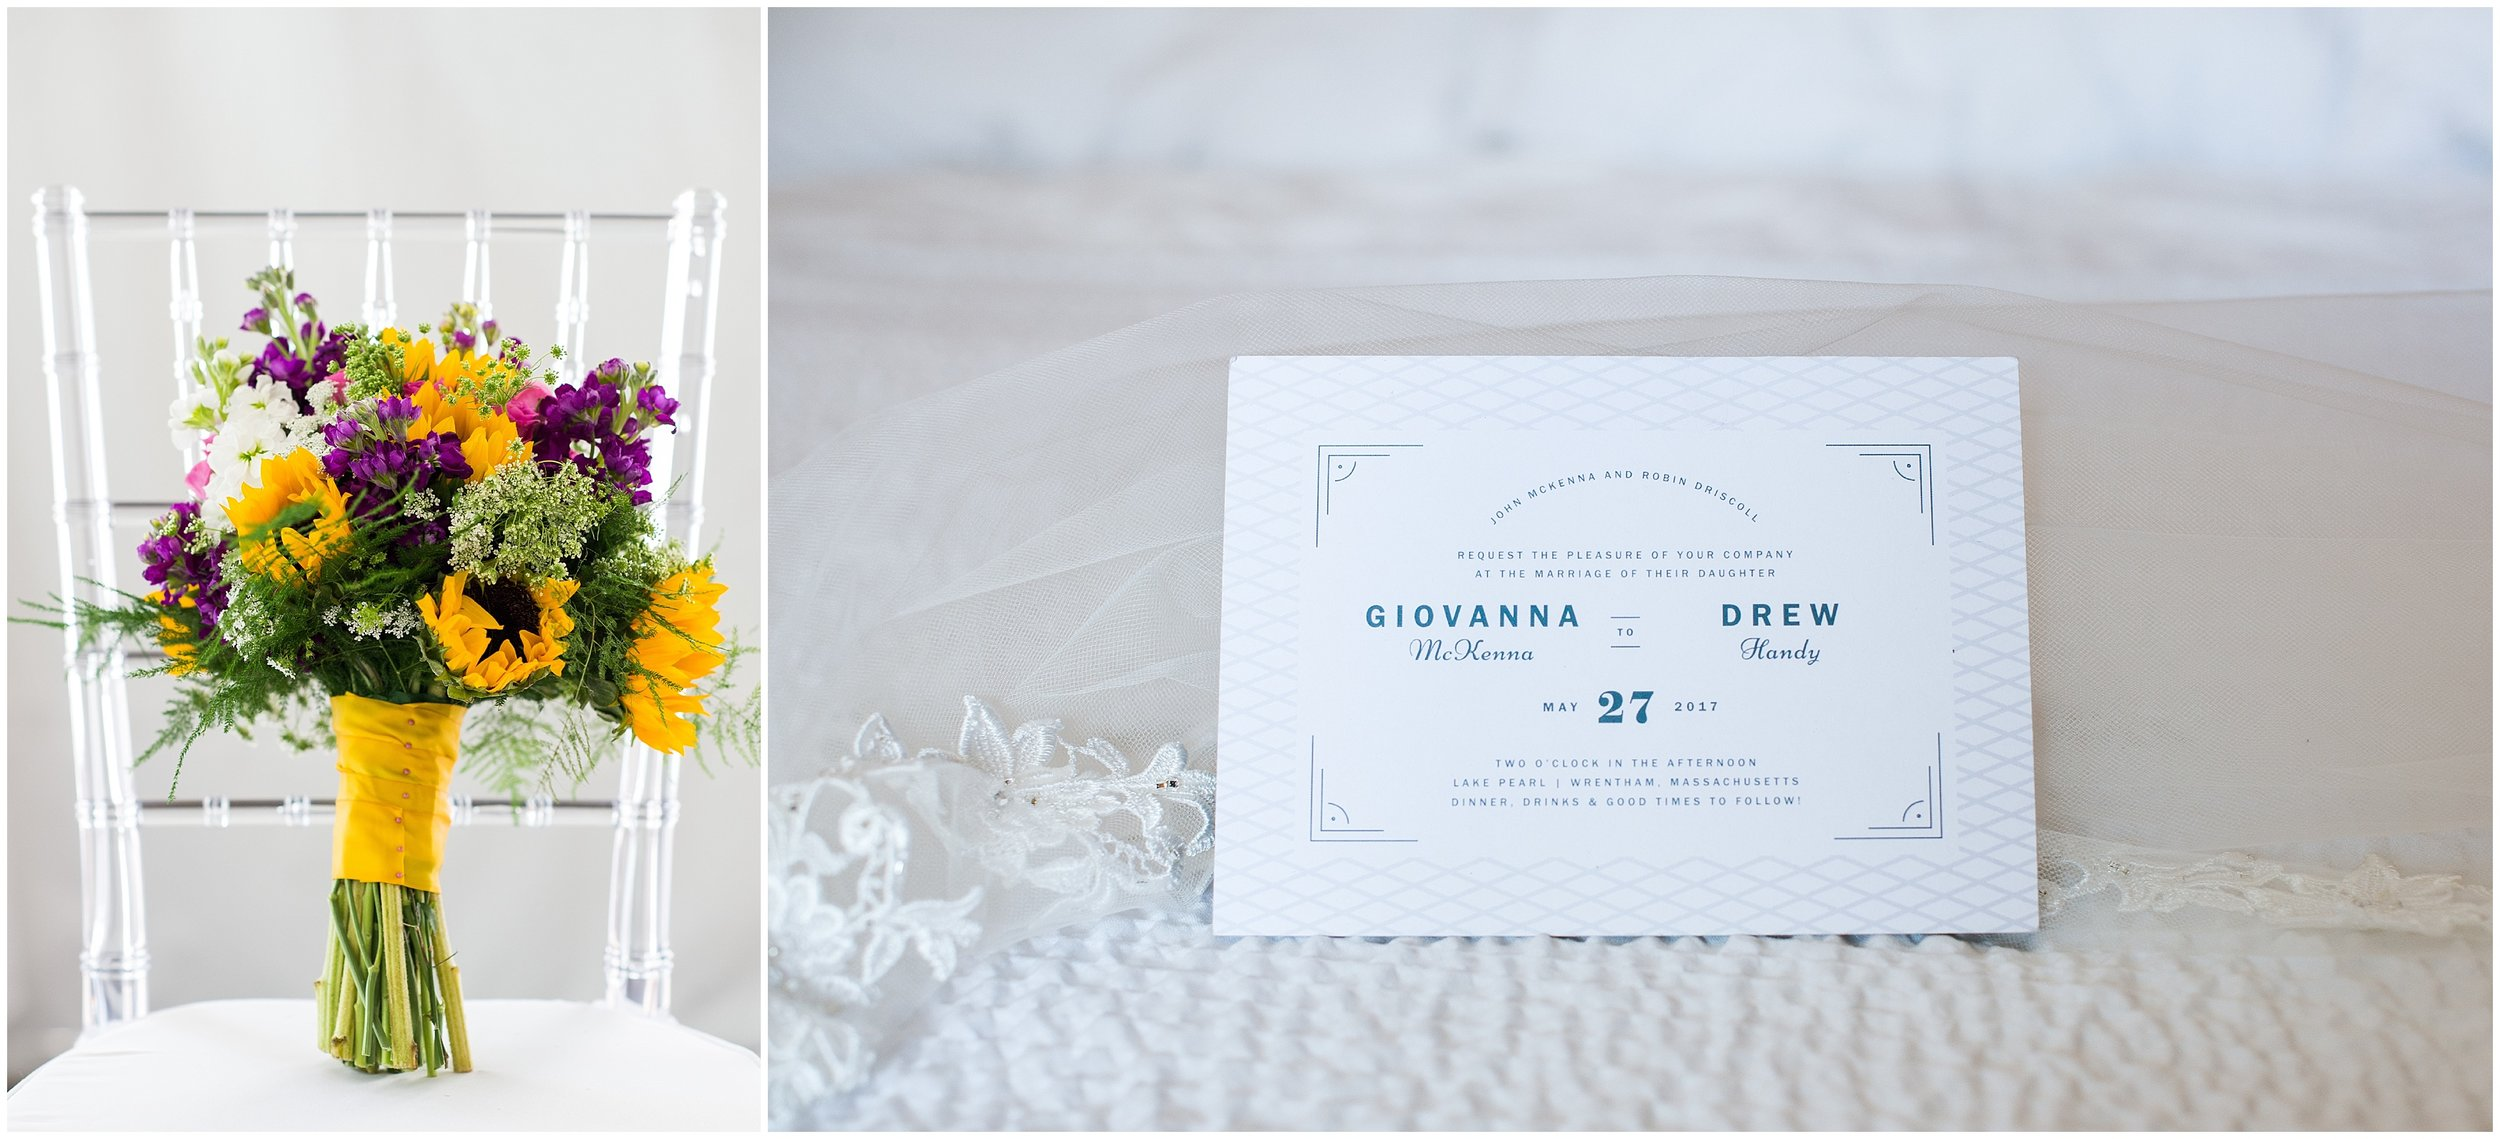 wedding invitation and flowers